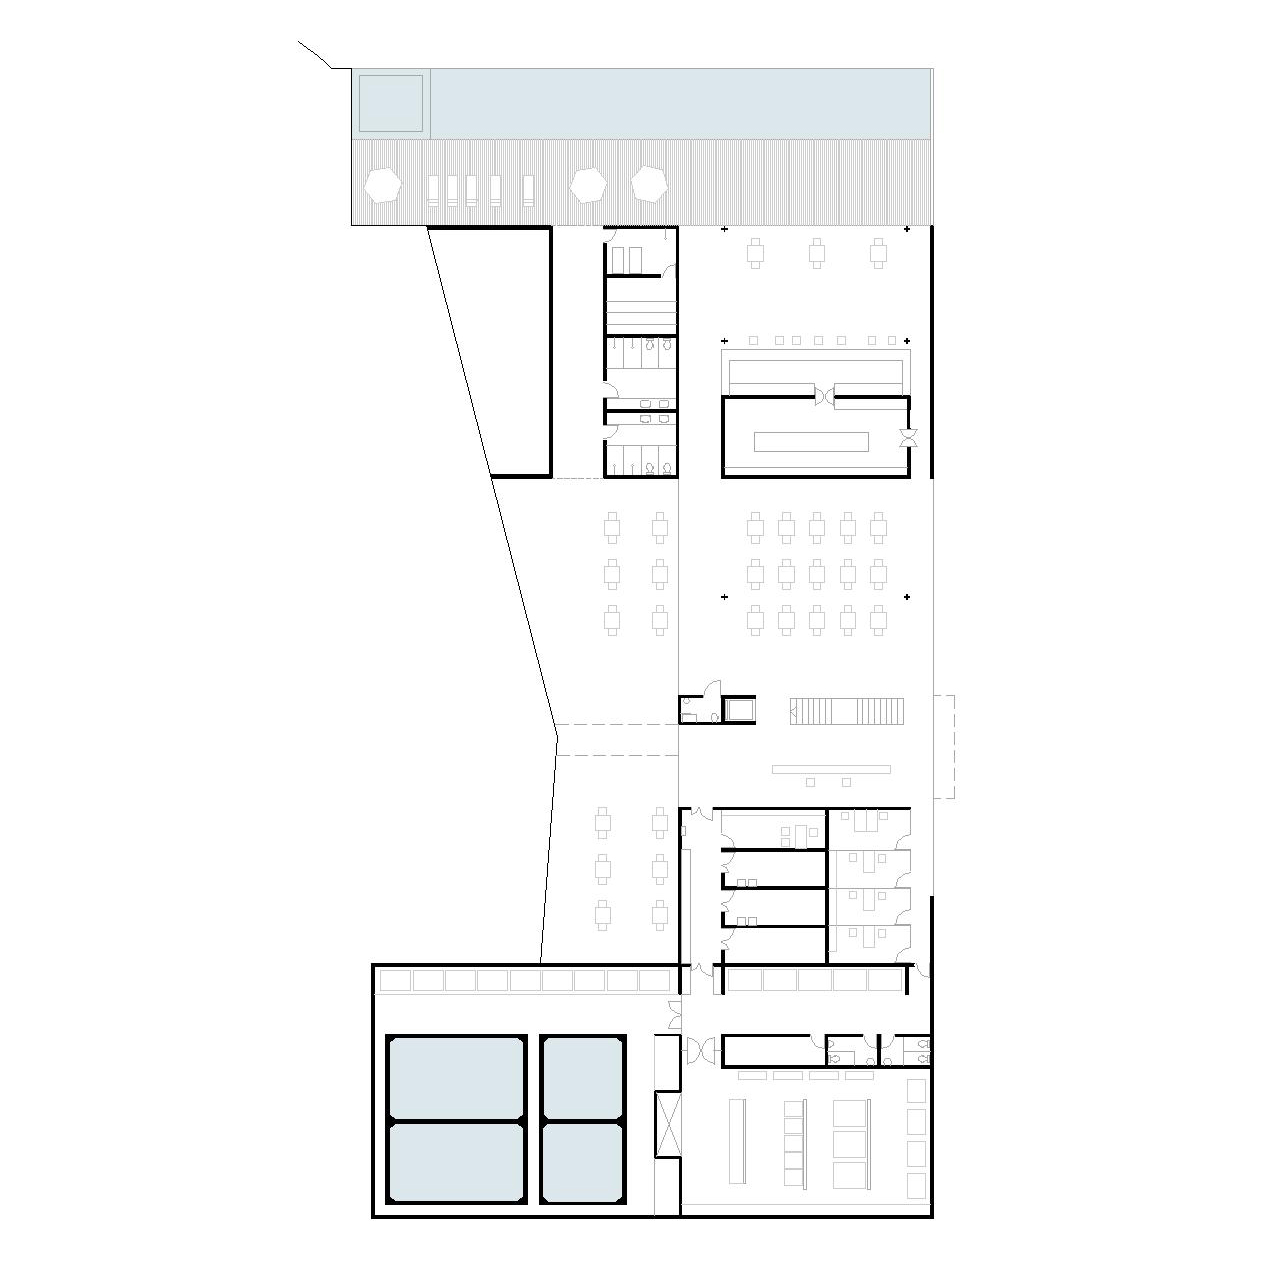 Projeto Aliah um Hotel para Copa Verde 09 Nivel 54 Apoio Hotel #575774 1280 1280